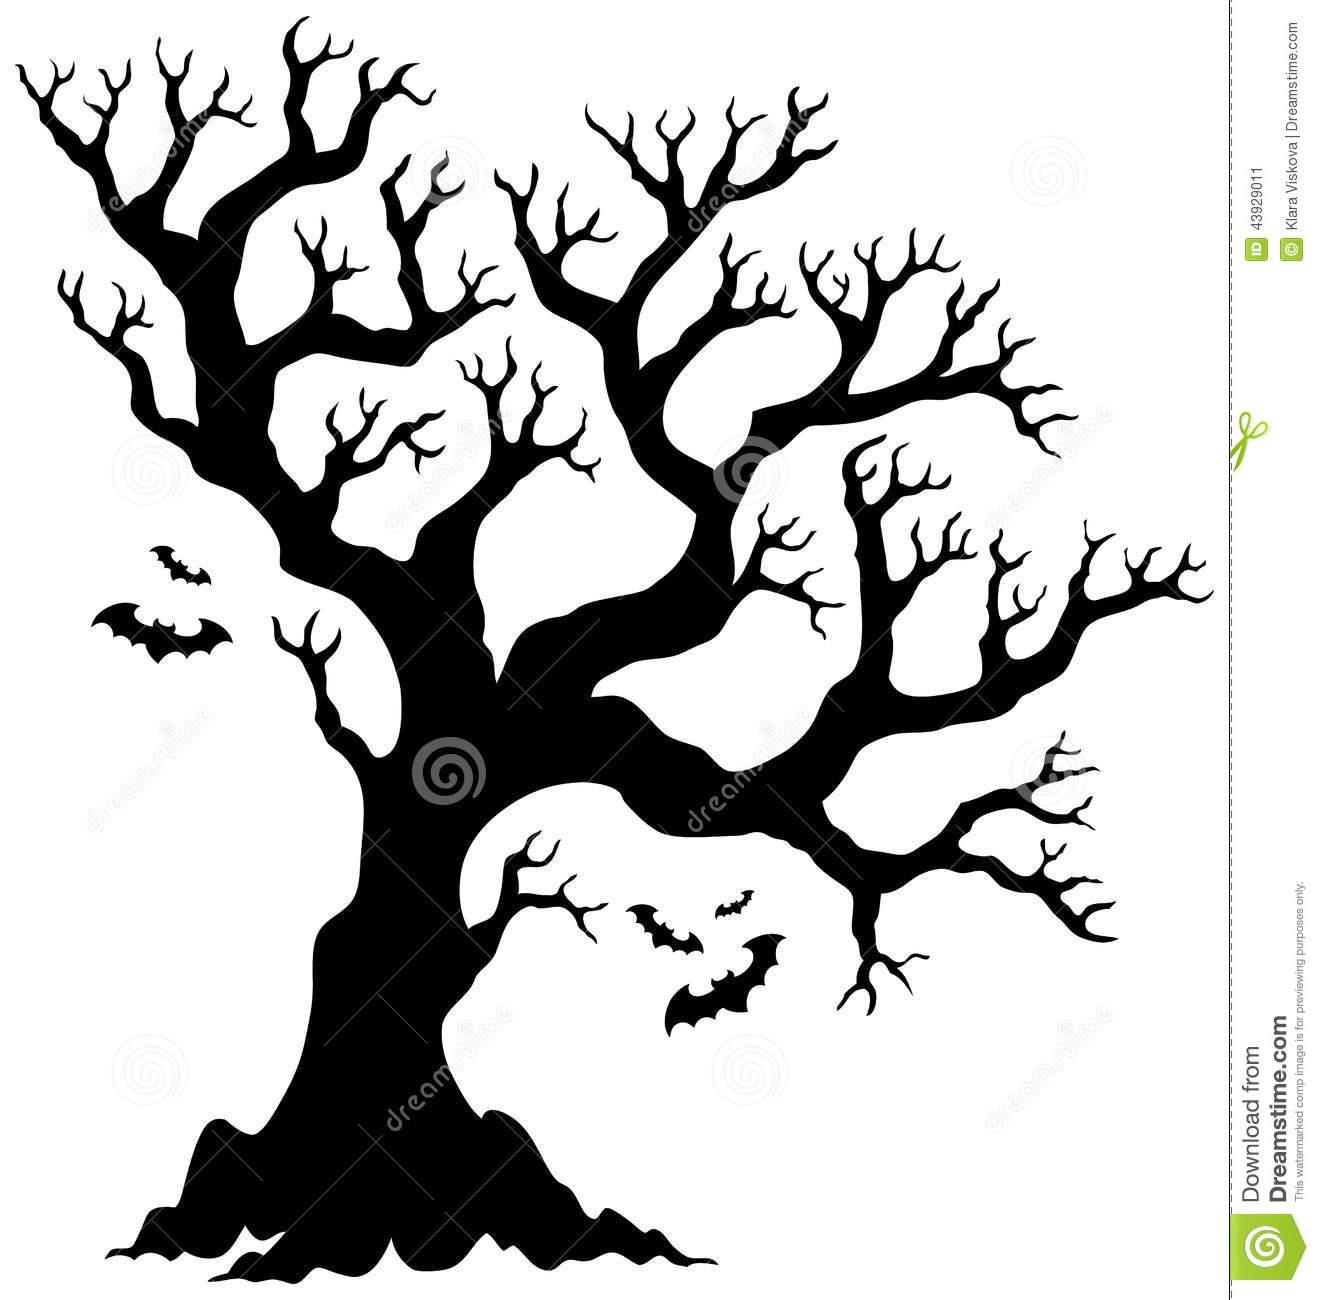 1319x1300 Twisted Tree Design